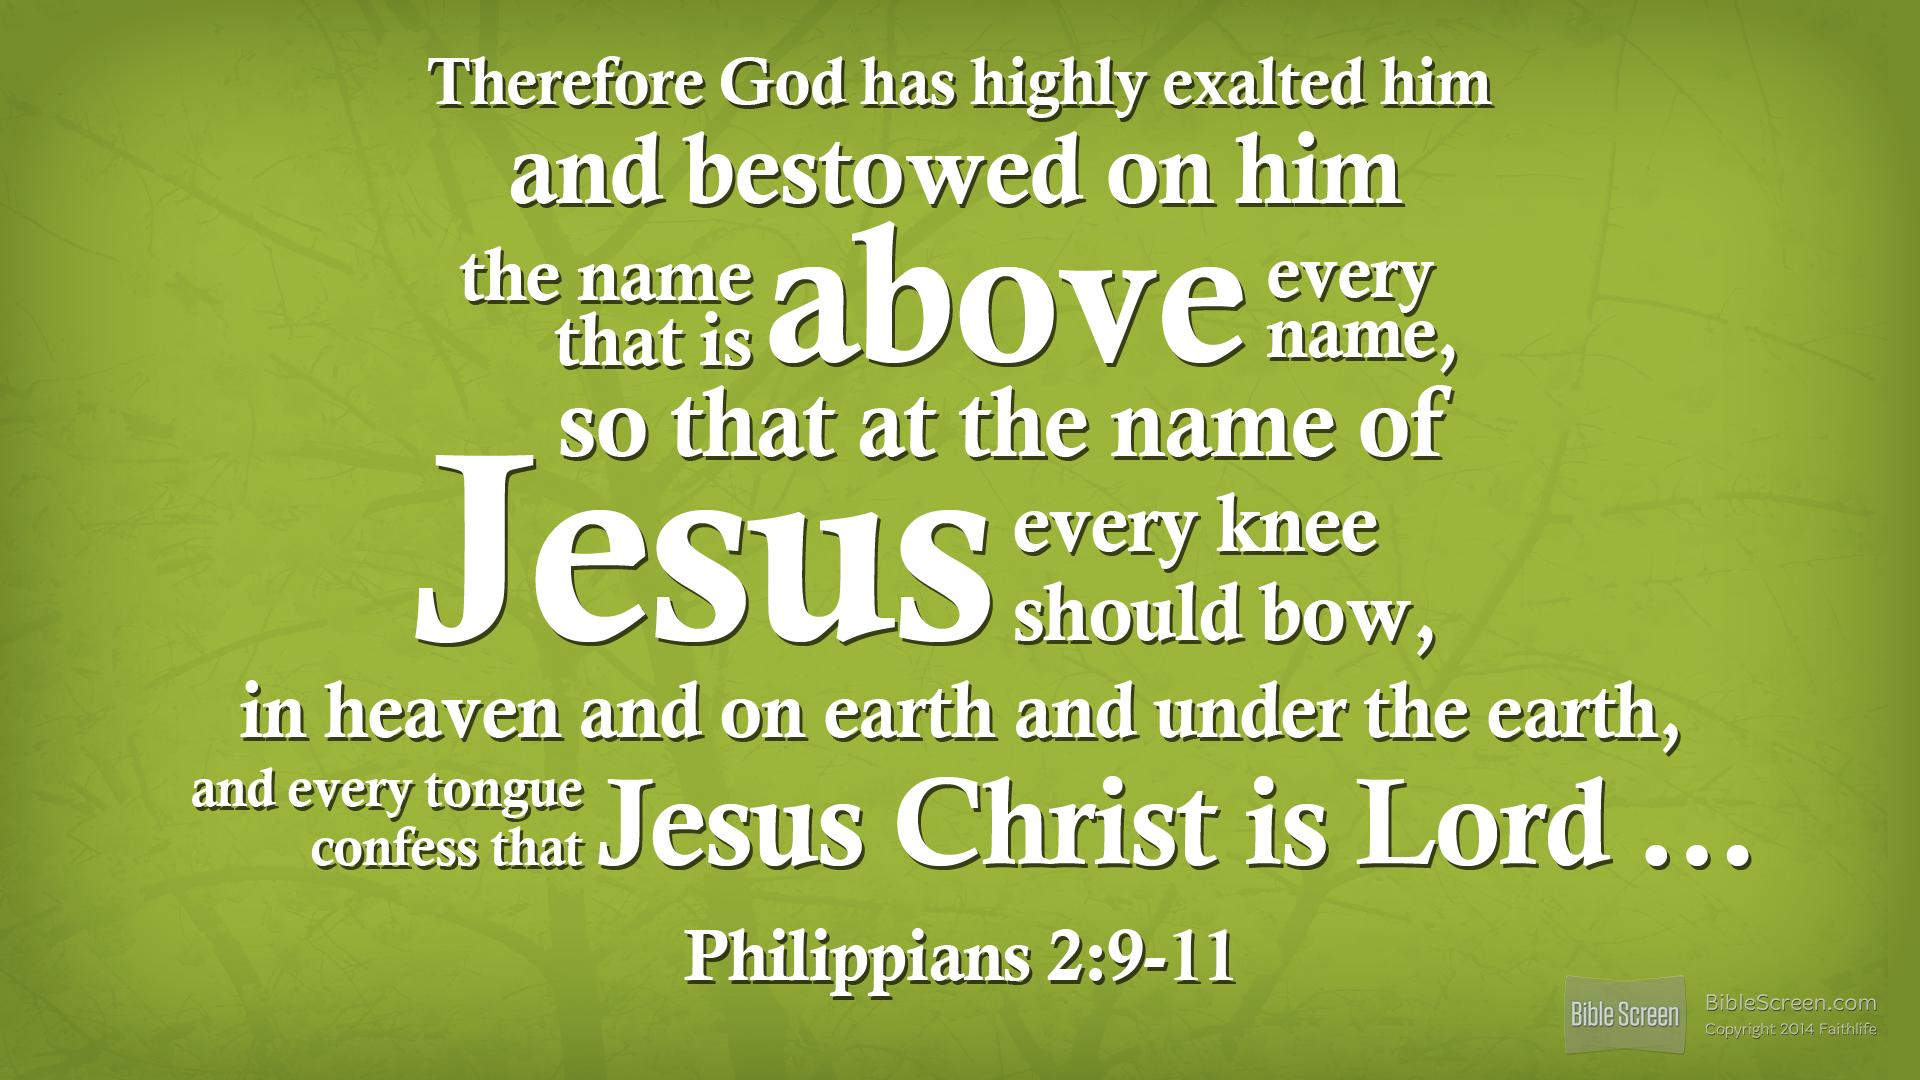 philipians 2 1 11